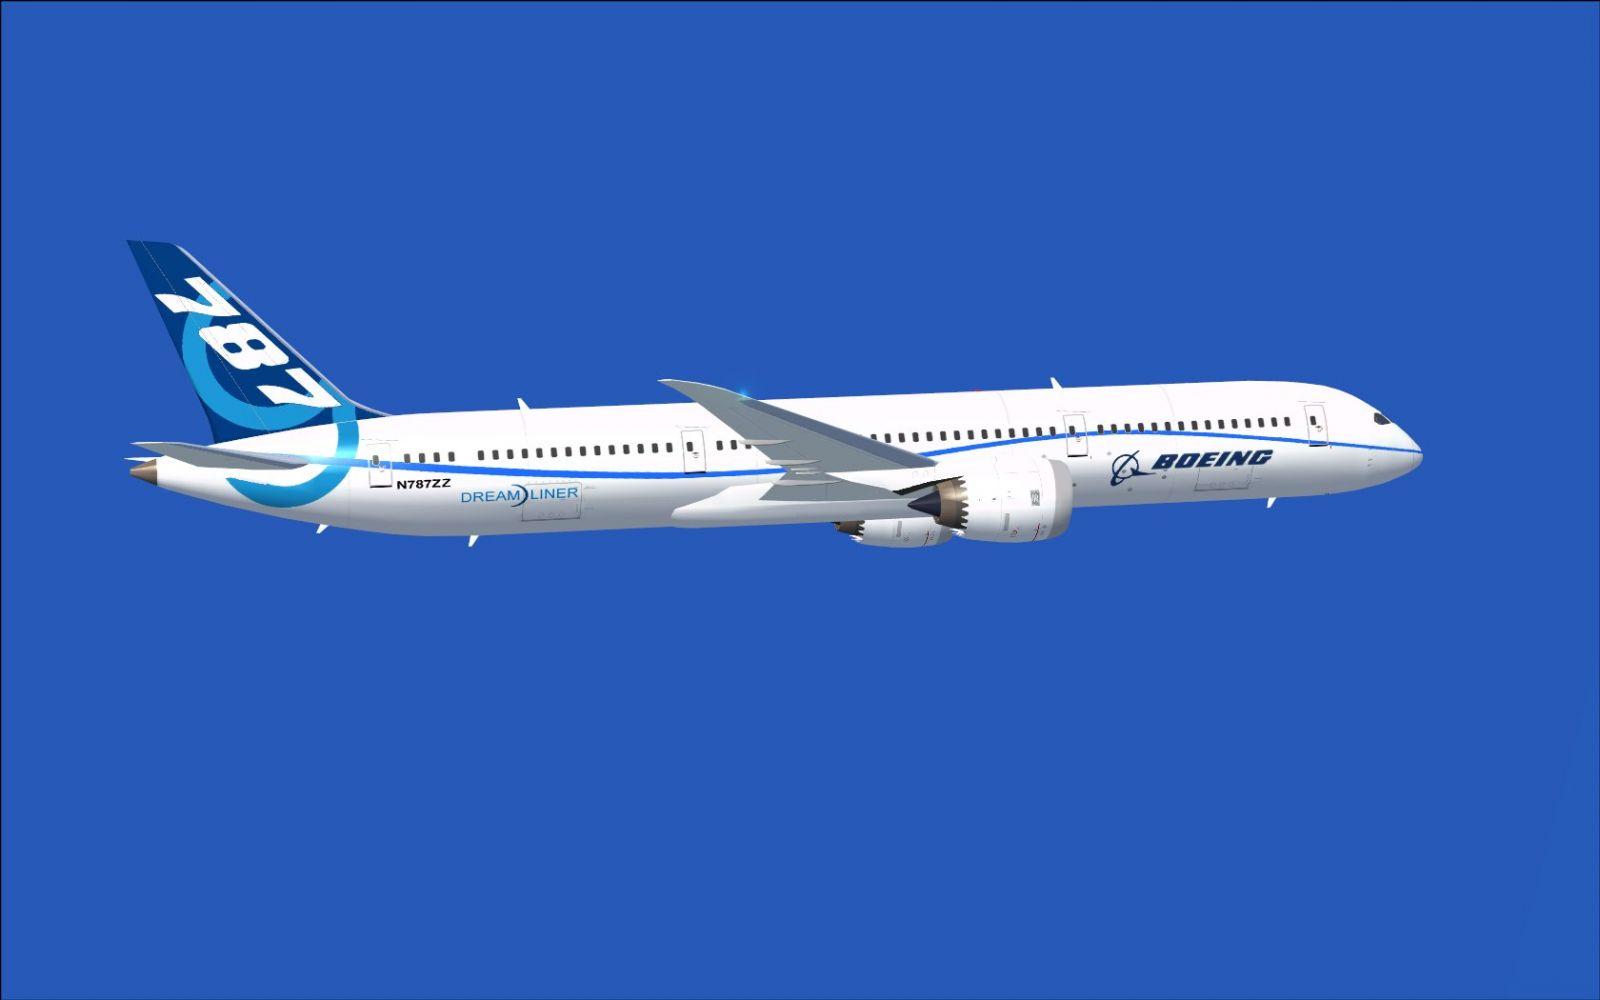 Http Flyawaysimulation Com Downloads Files 3645 Fsx Boeing Flight Test Airplane 787 9